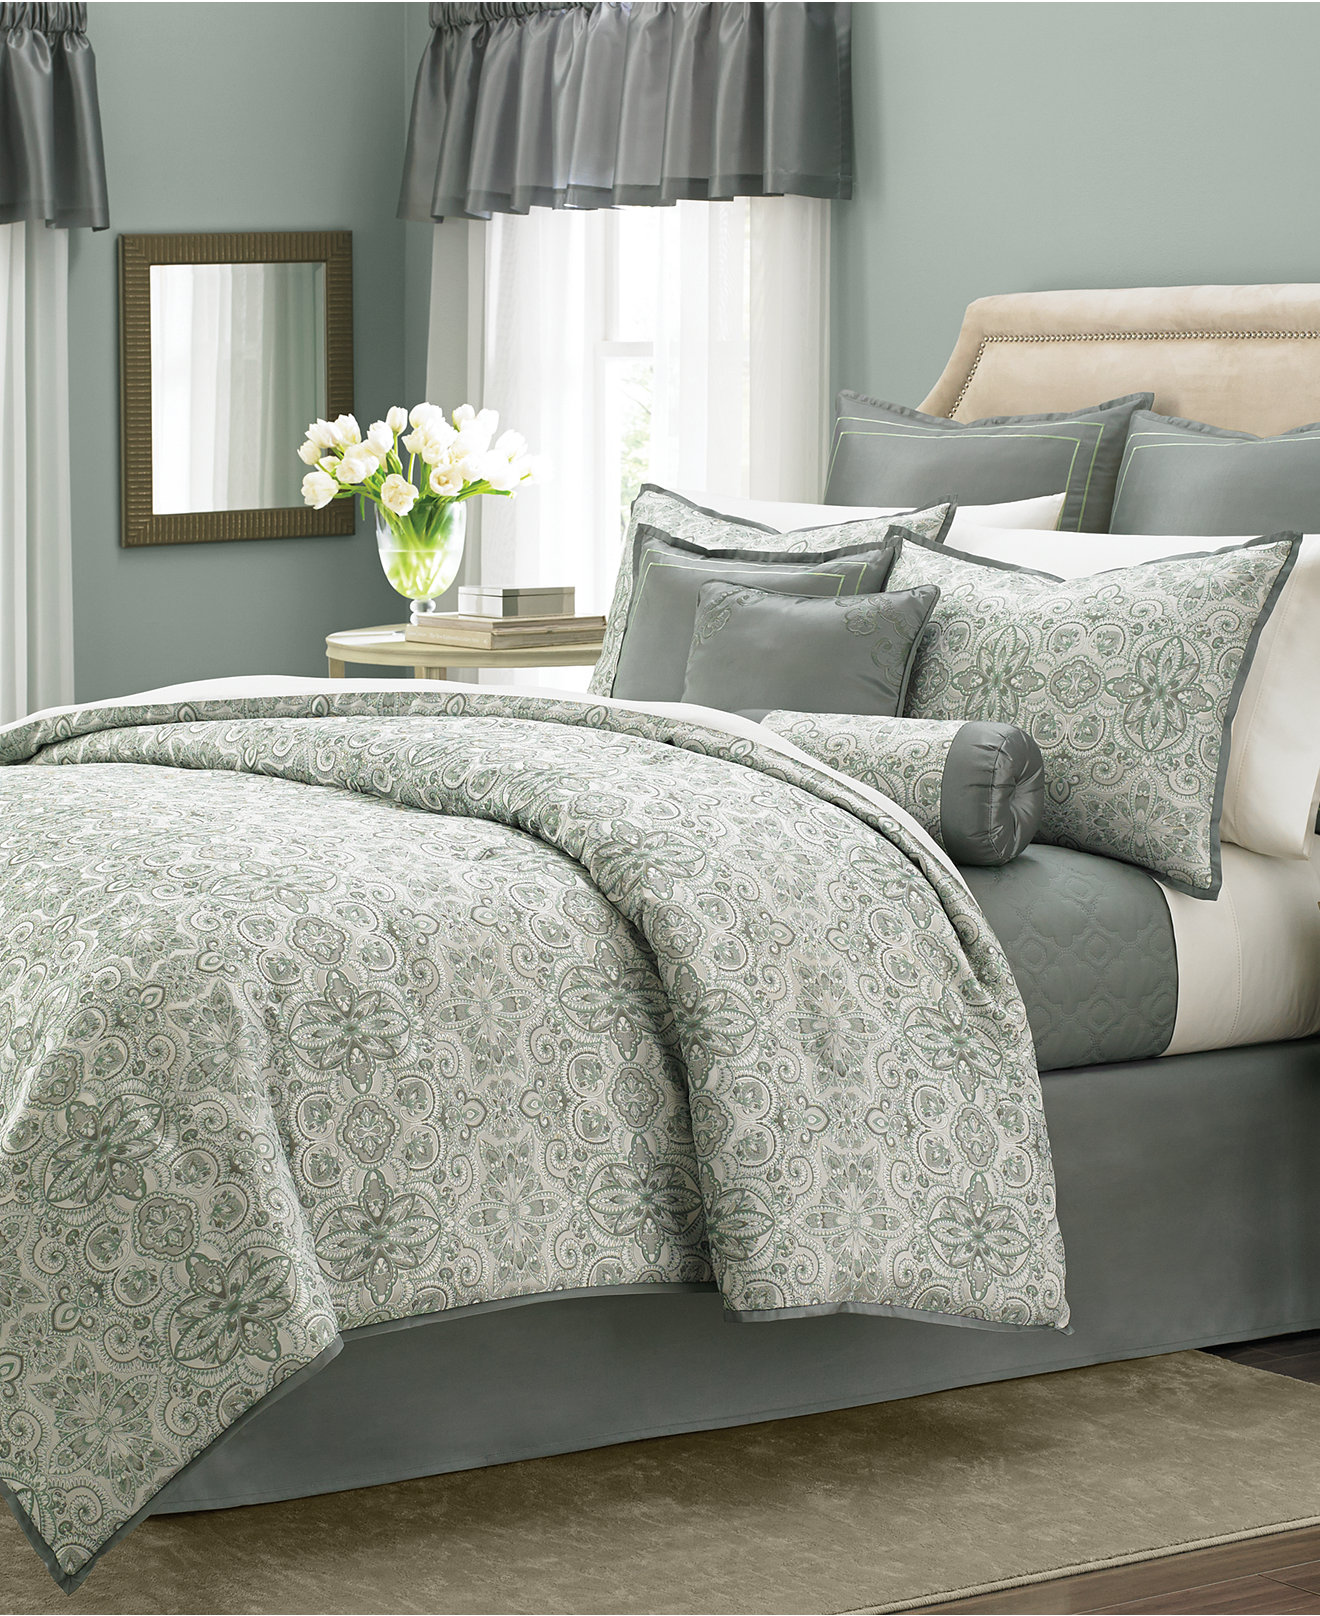 Dormitorios matrimonio modernos date un capricho hoy - Decorar cama con cojines ...